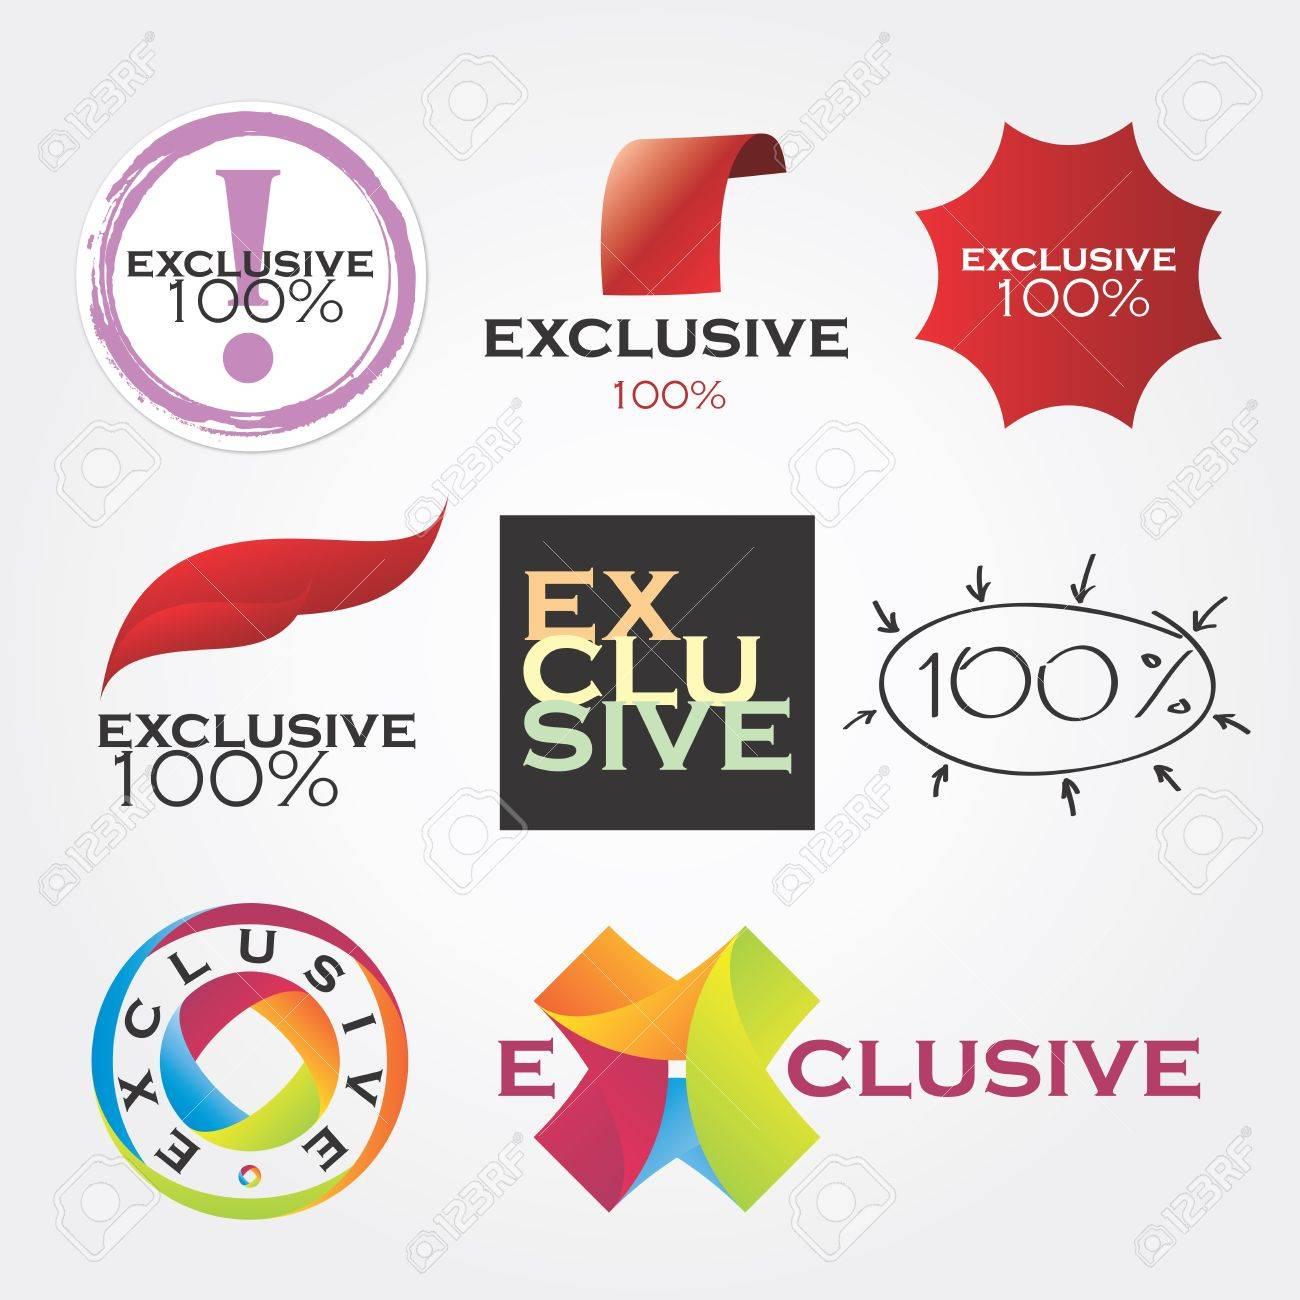 exclusive icon Stock Vector - 18563878